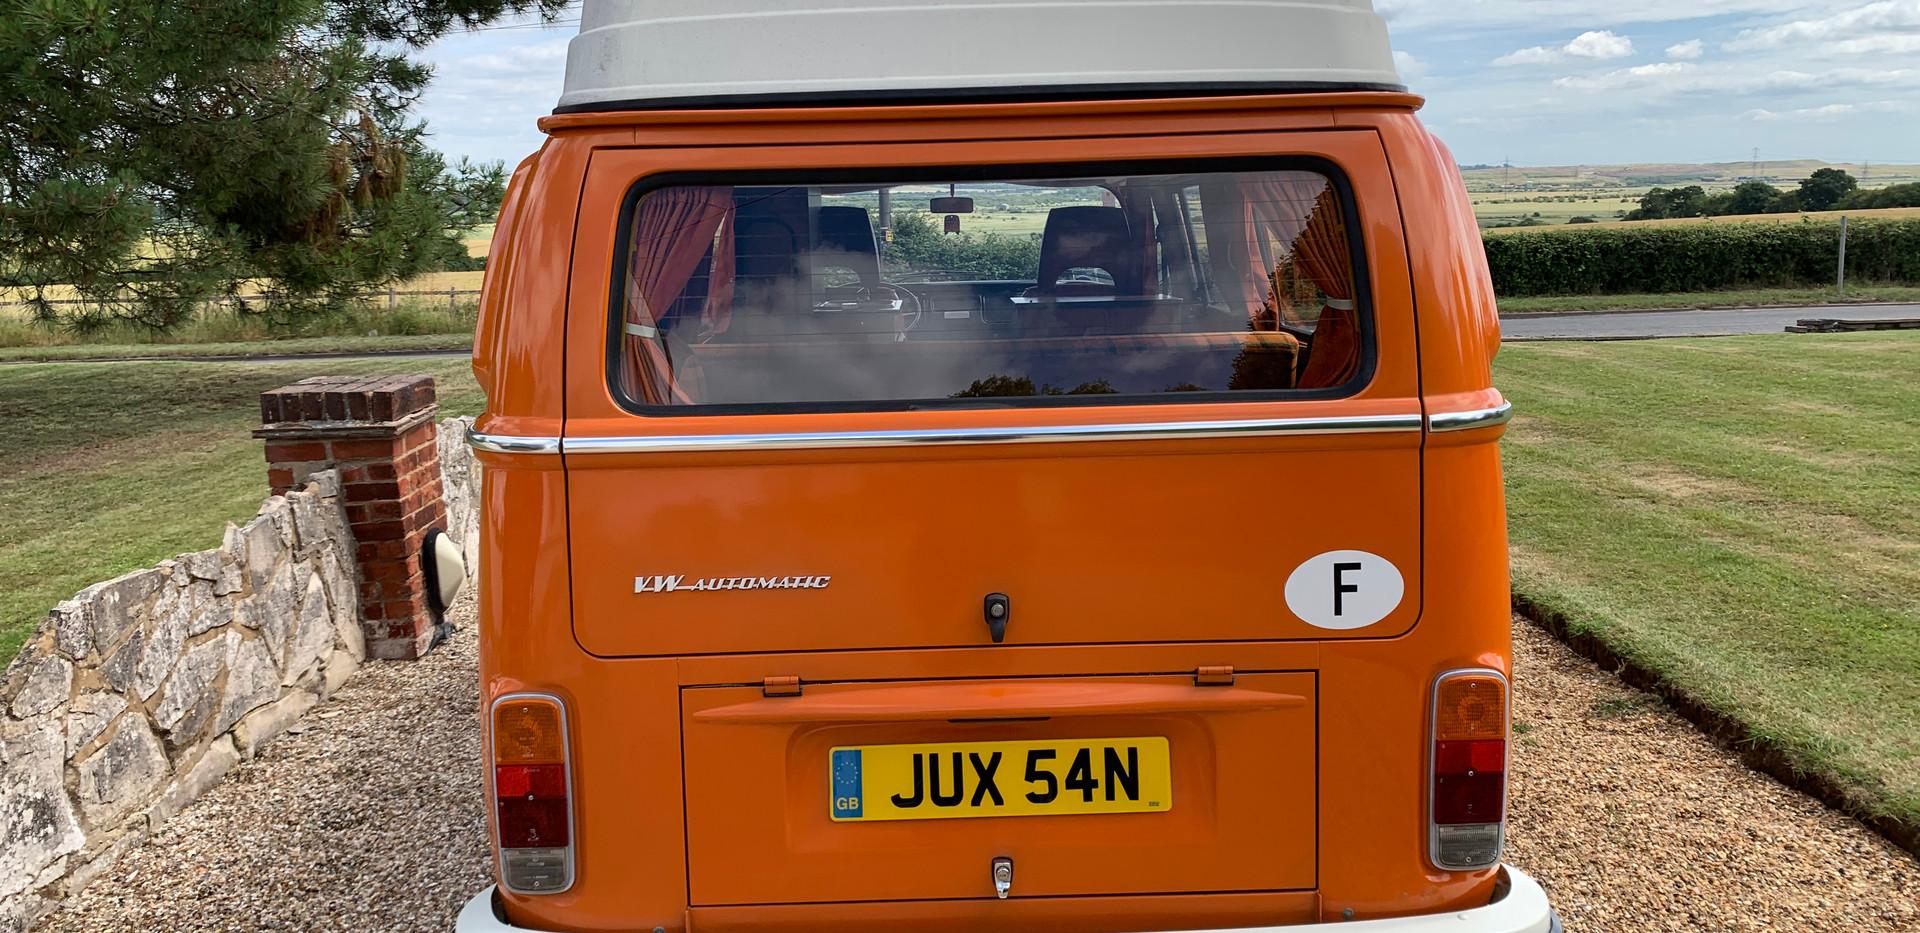 Campervan for sale Essex.jpg